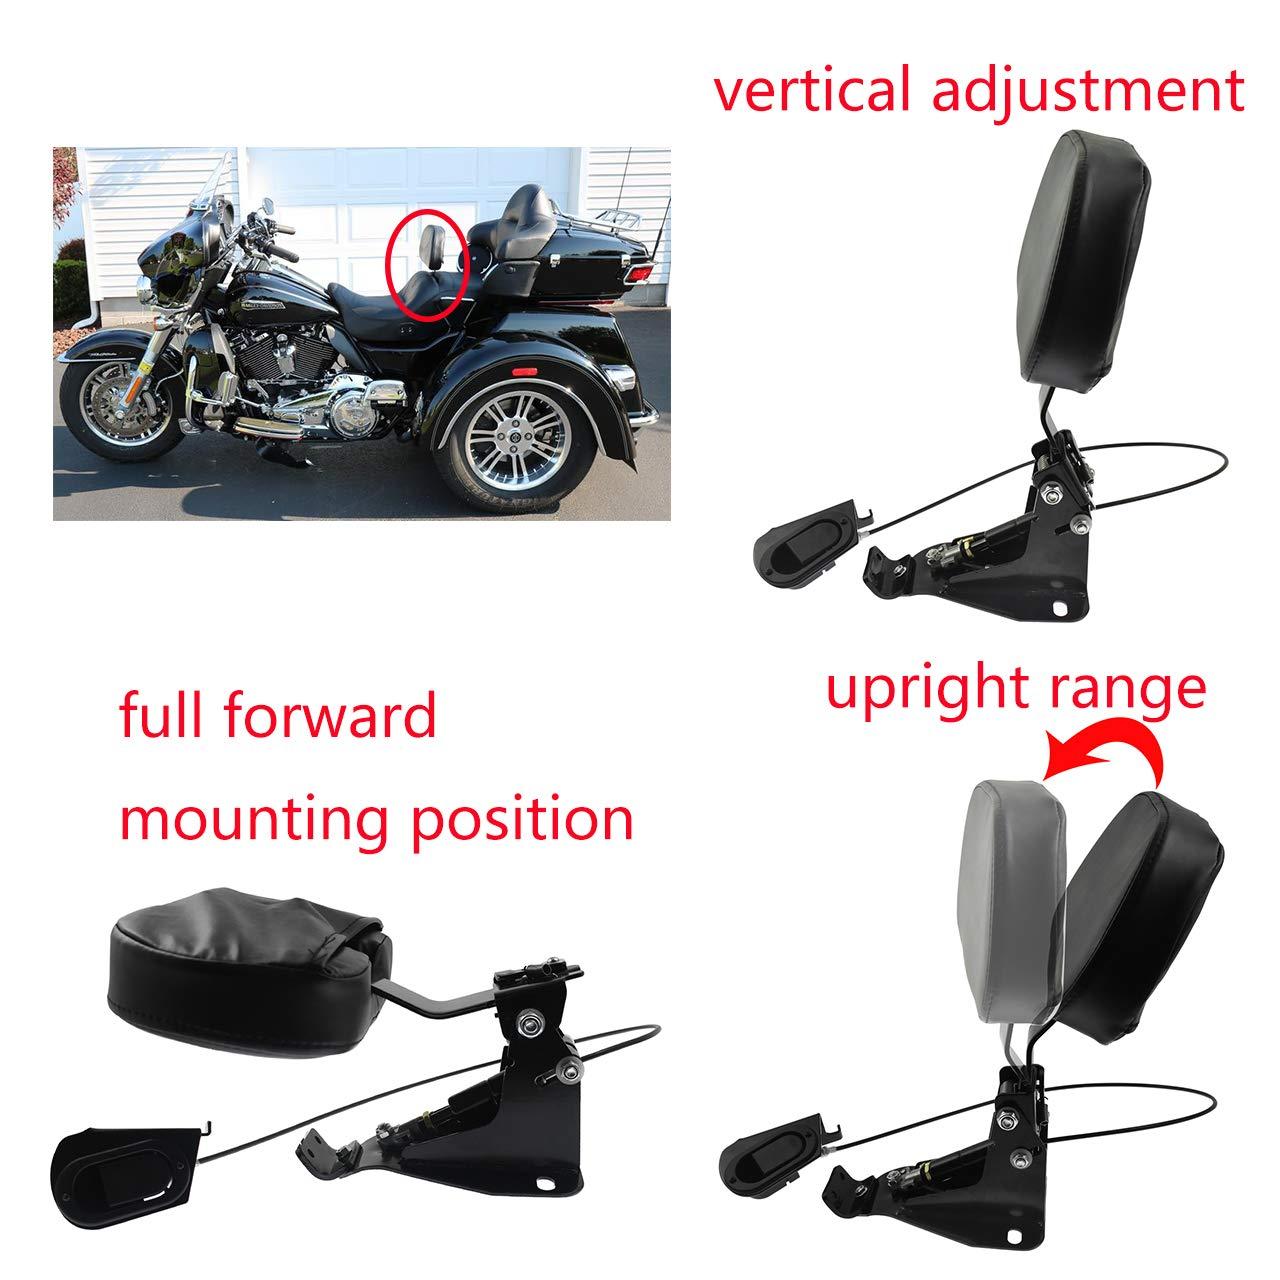 Adjustable Driver Backrest with Mount for Harley Touring Road King Electra Glide CVO 2009-2018